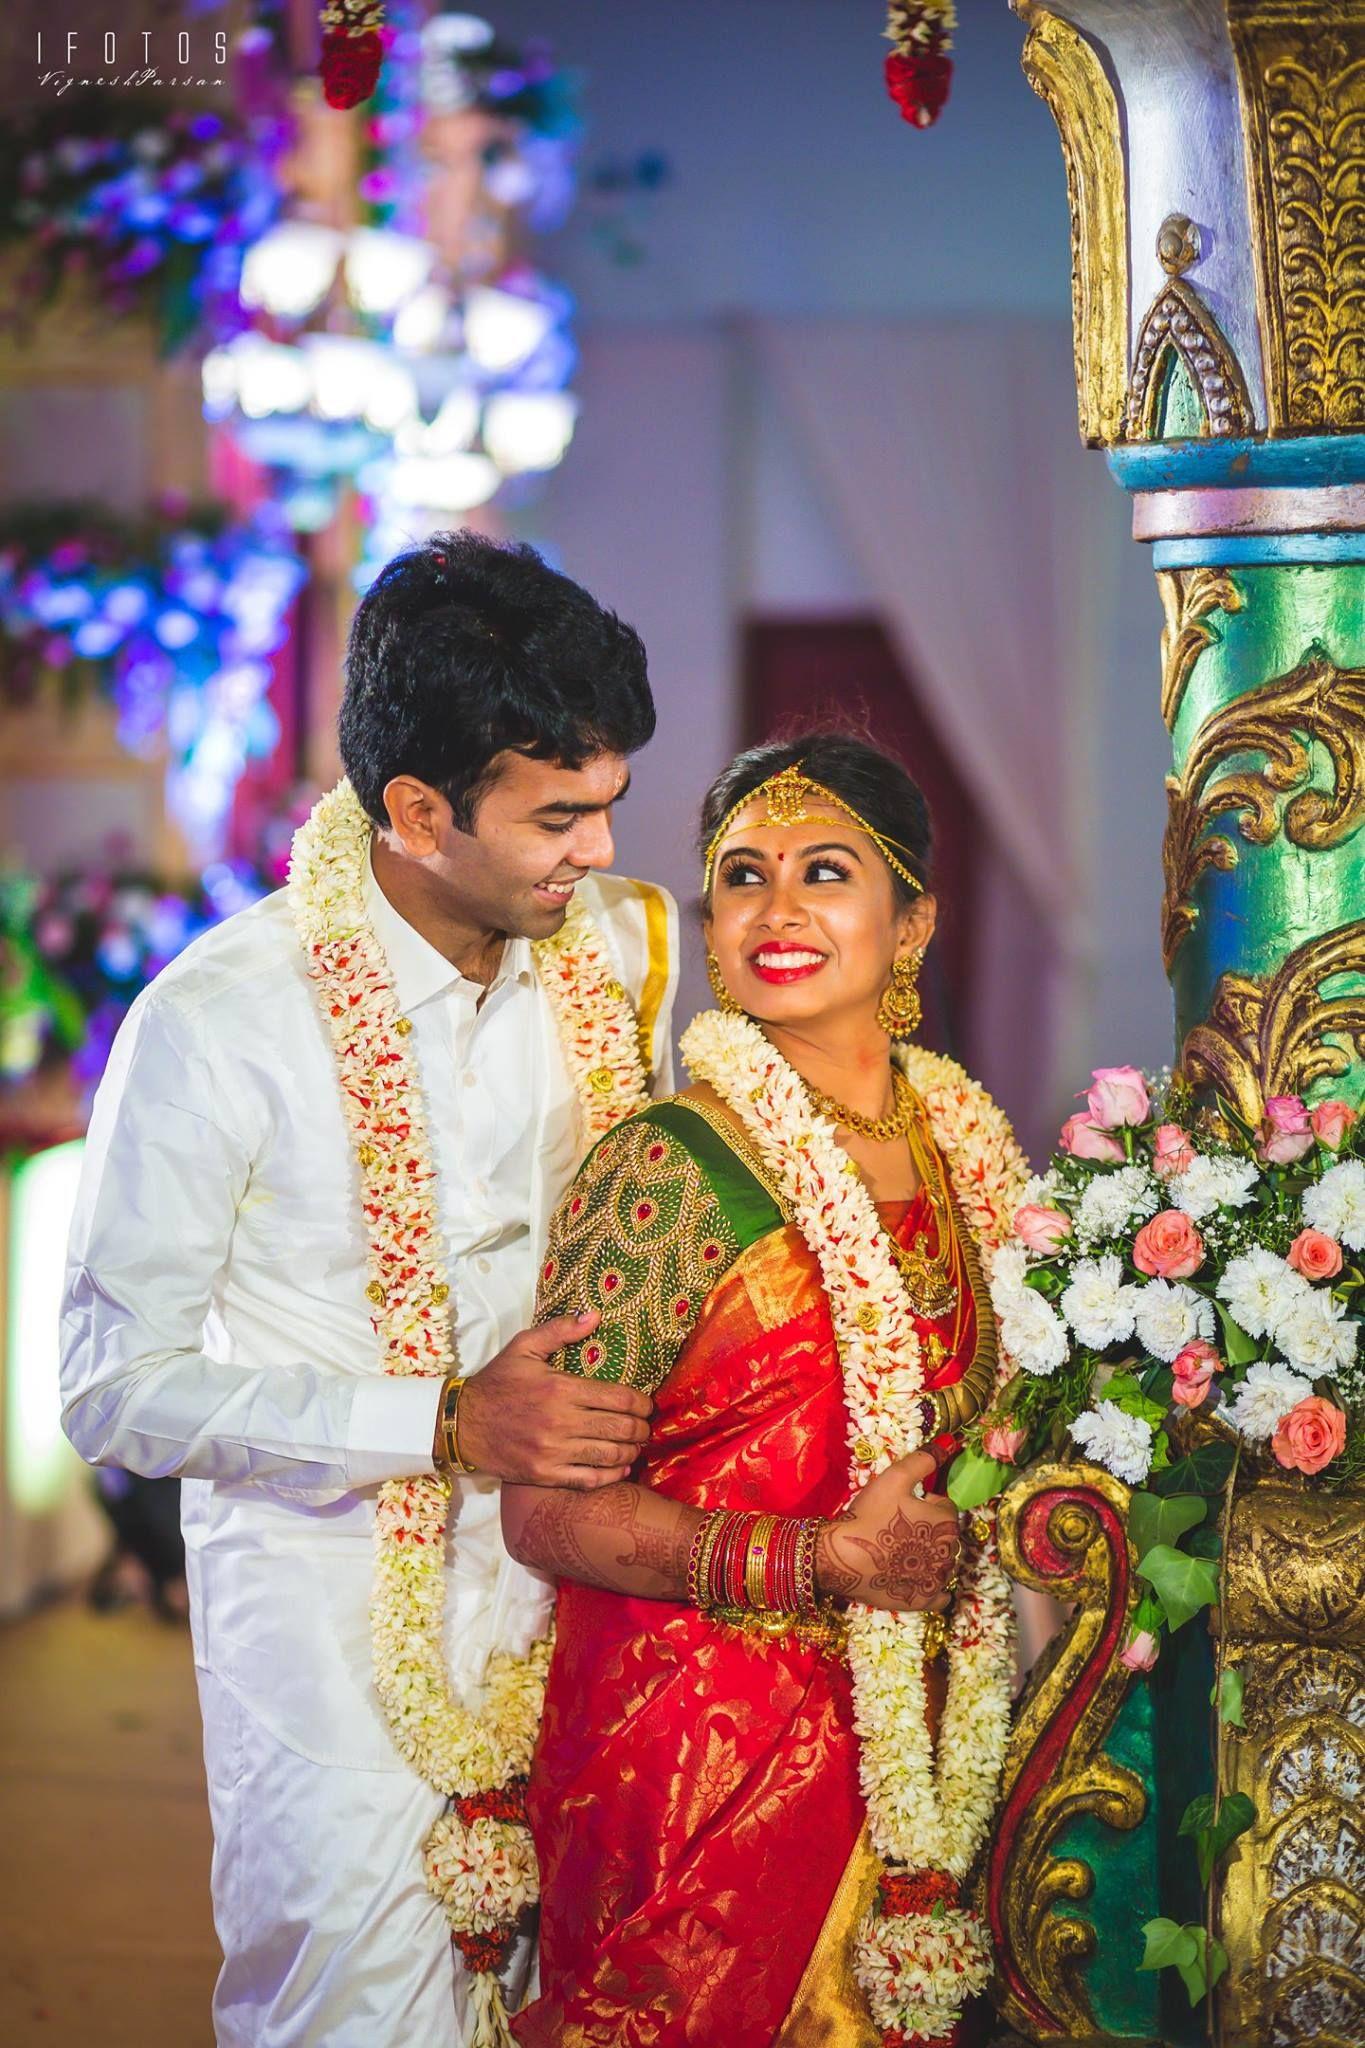 8fada09b4 South Indian Wedding Dresses For Couples - raveitsafe